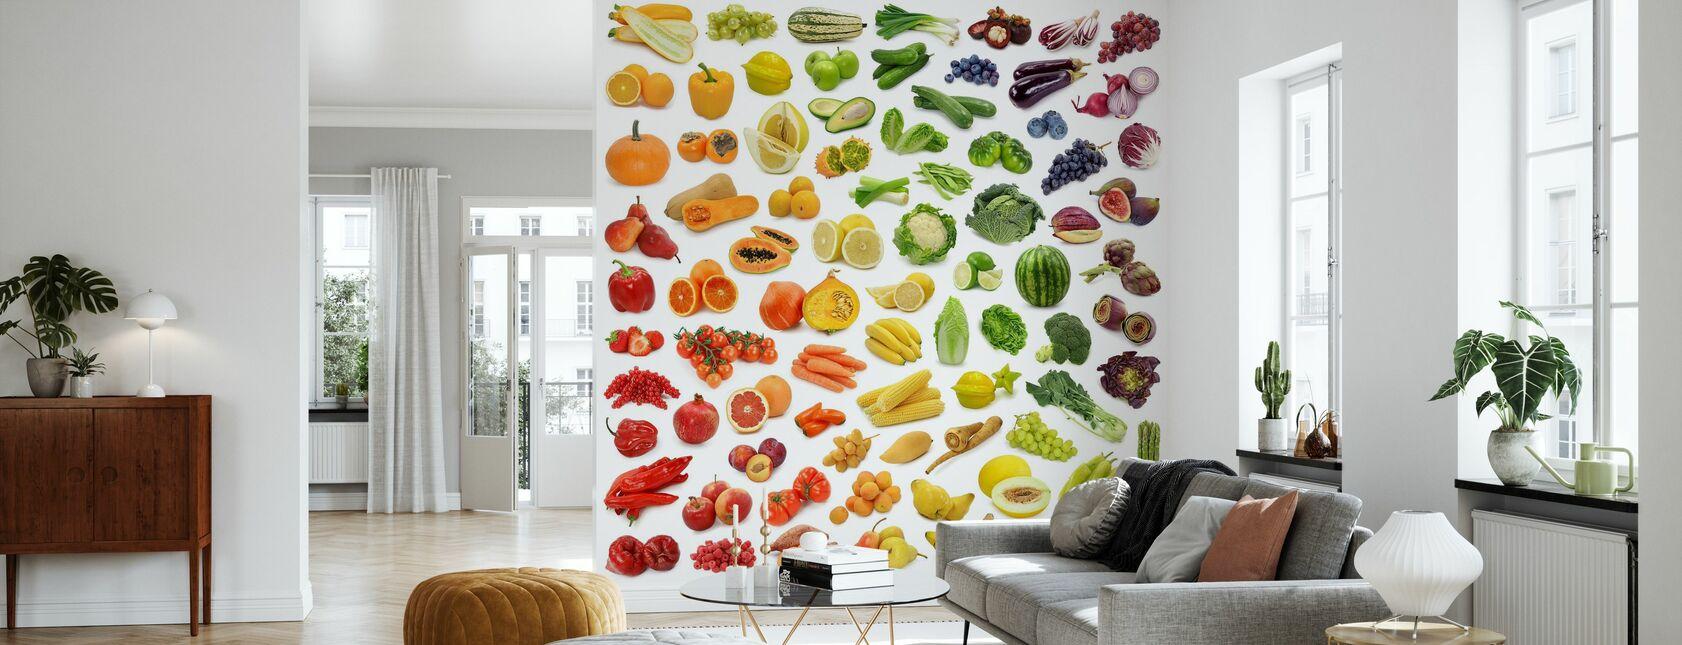 Juicy Fruits - Wallpaper - Living Room